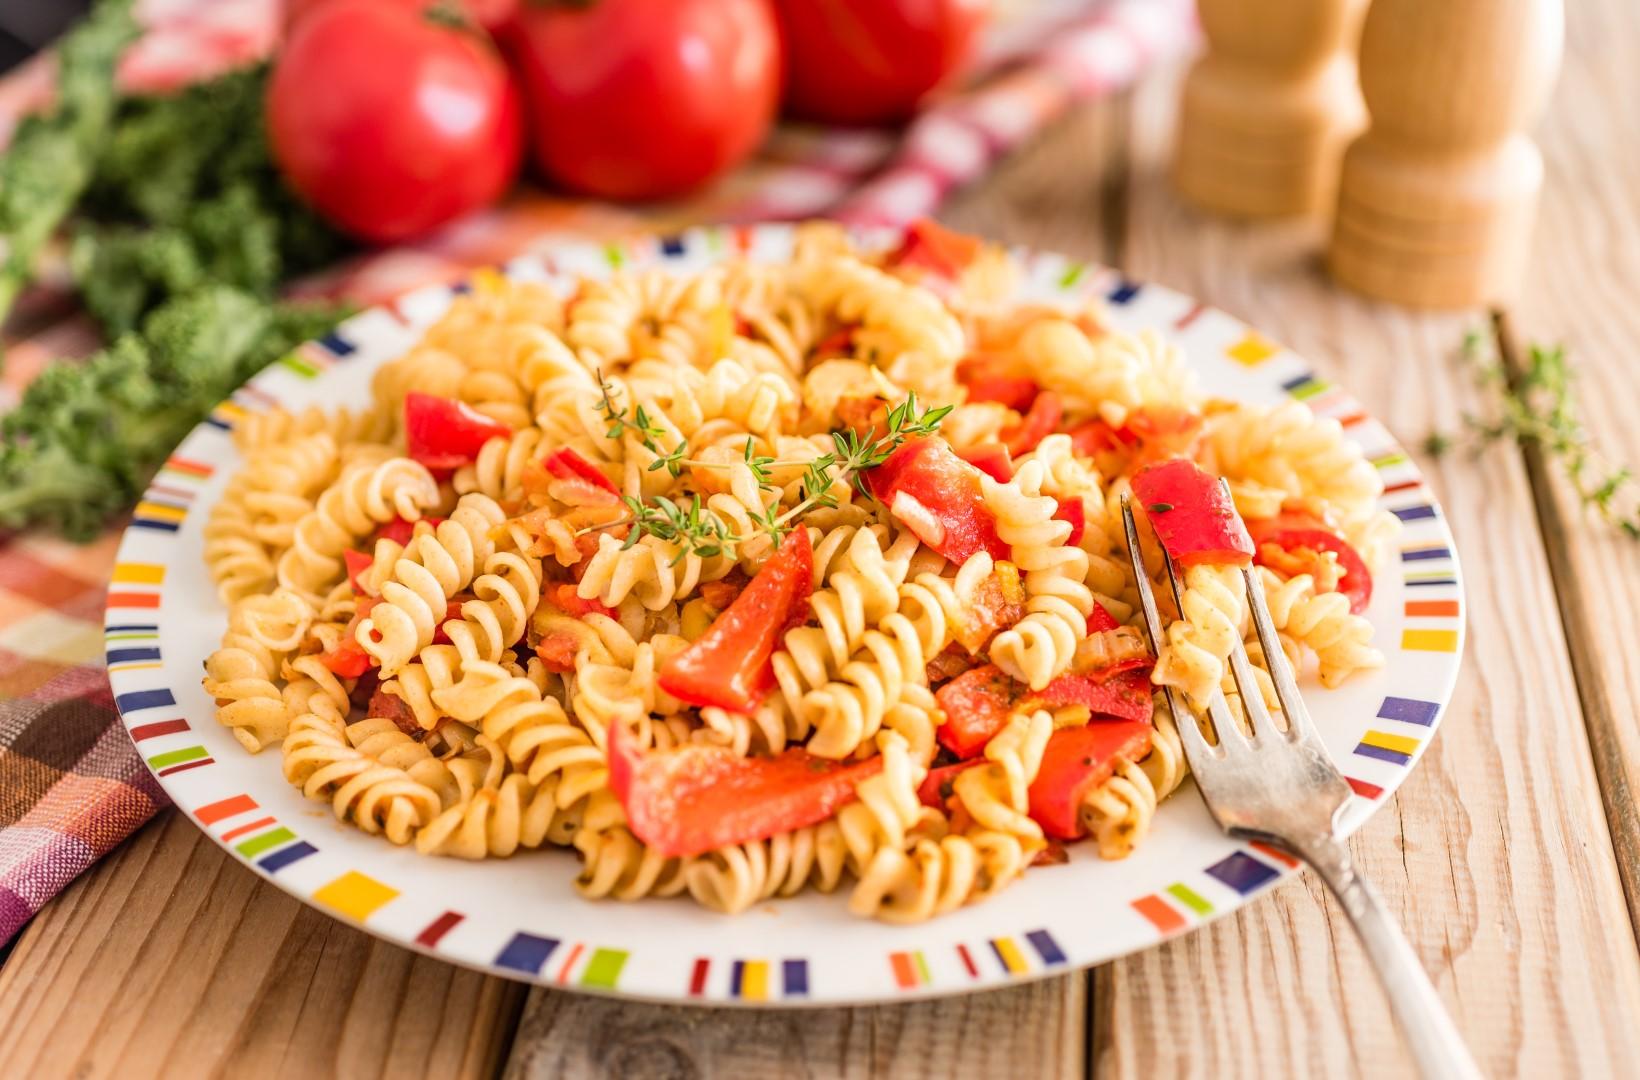 Pasta_fusili_tomato_sauce_peppers